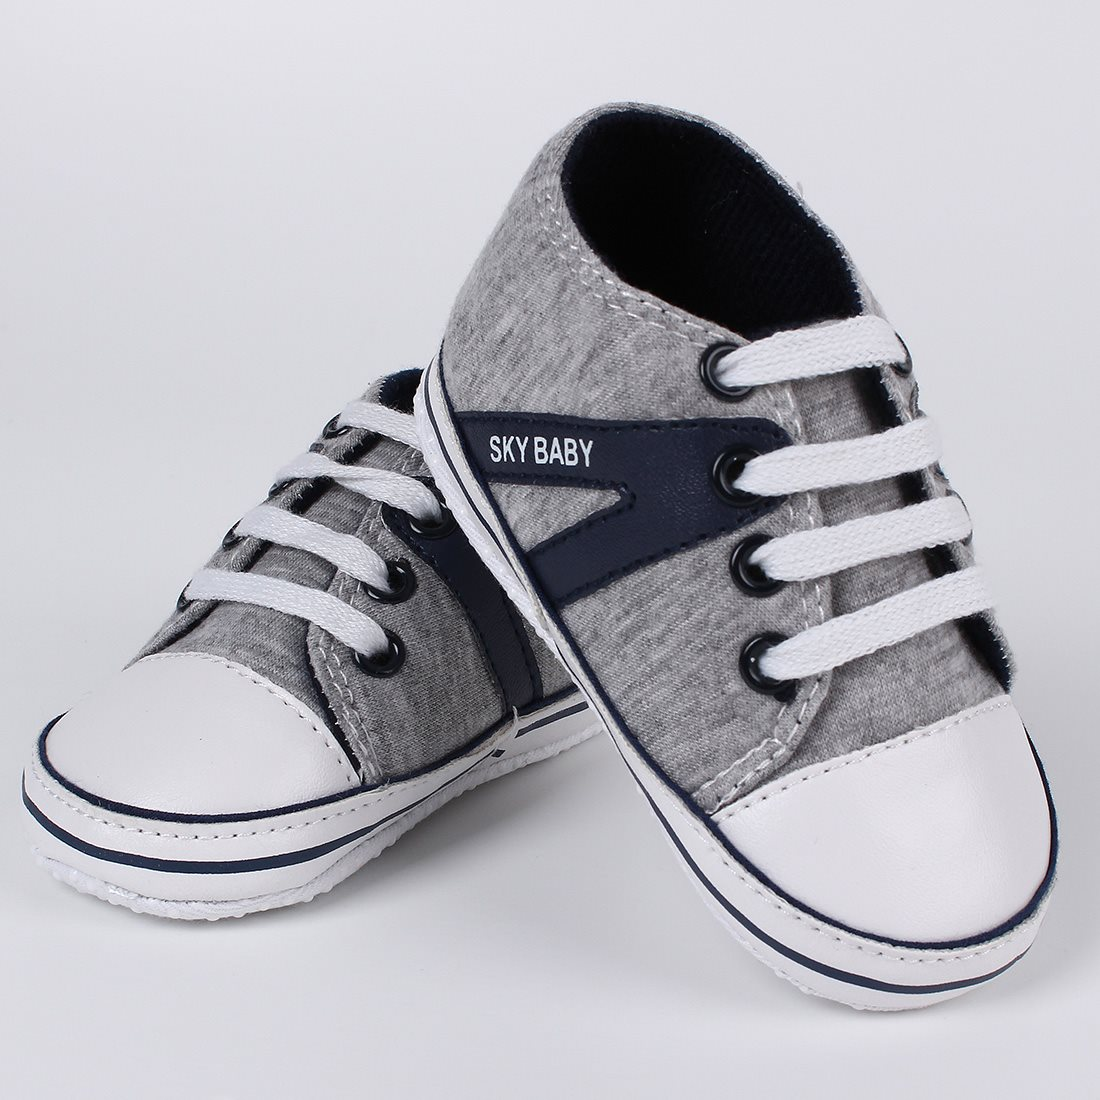 Hot Selling 11-13cm Cute Infant Toddler Baby Shoes Girl Boy Soft Sole Sneaker Prewalker First Walker Crib Sport 0-18 Months